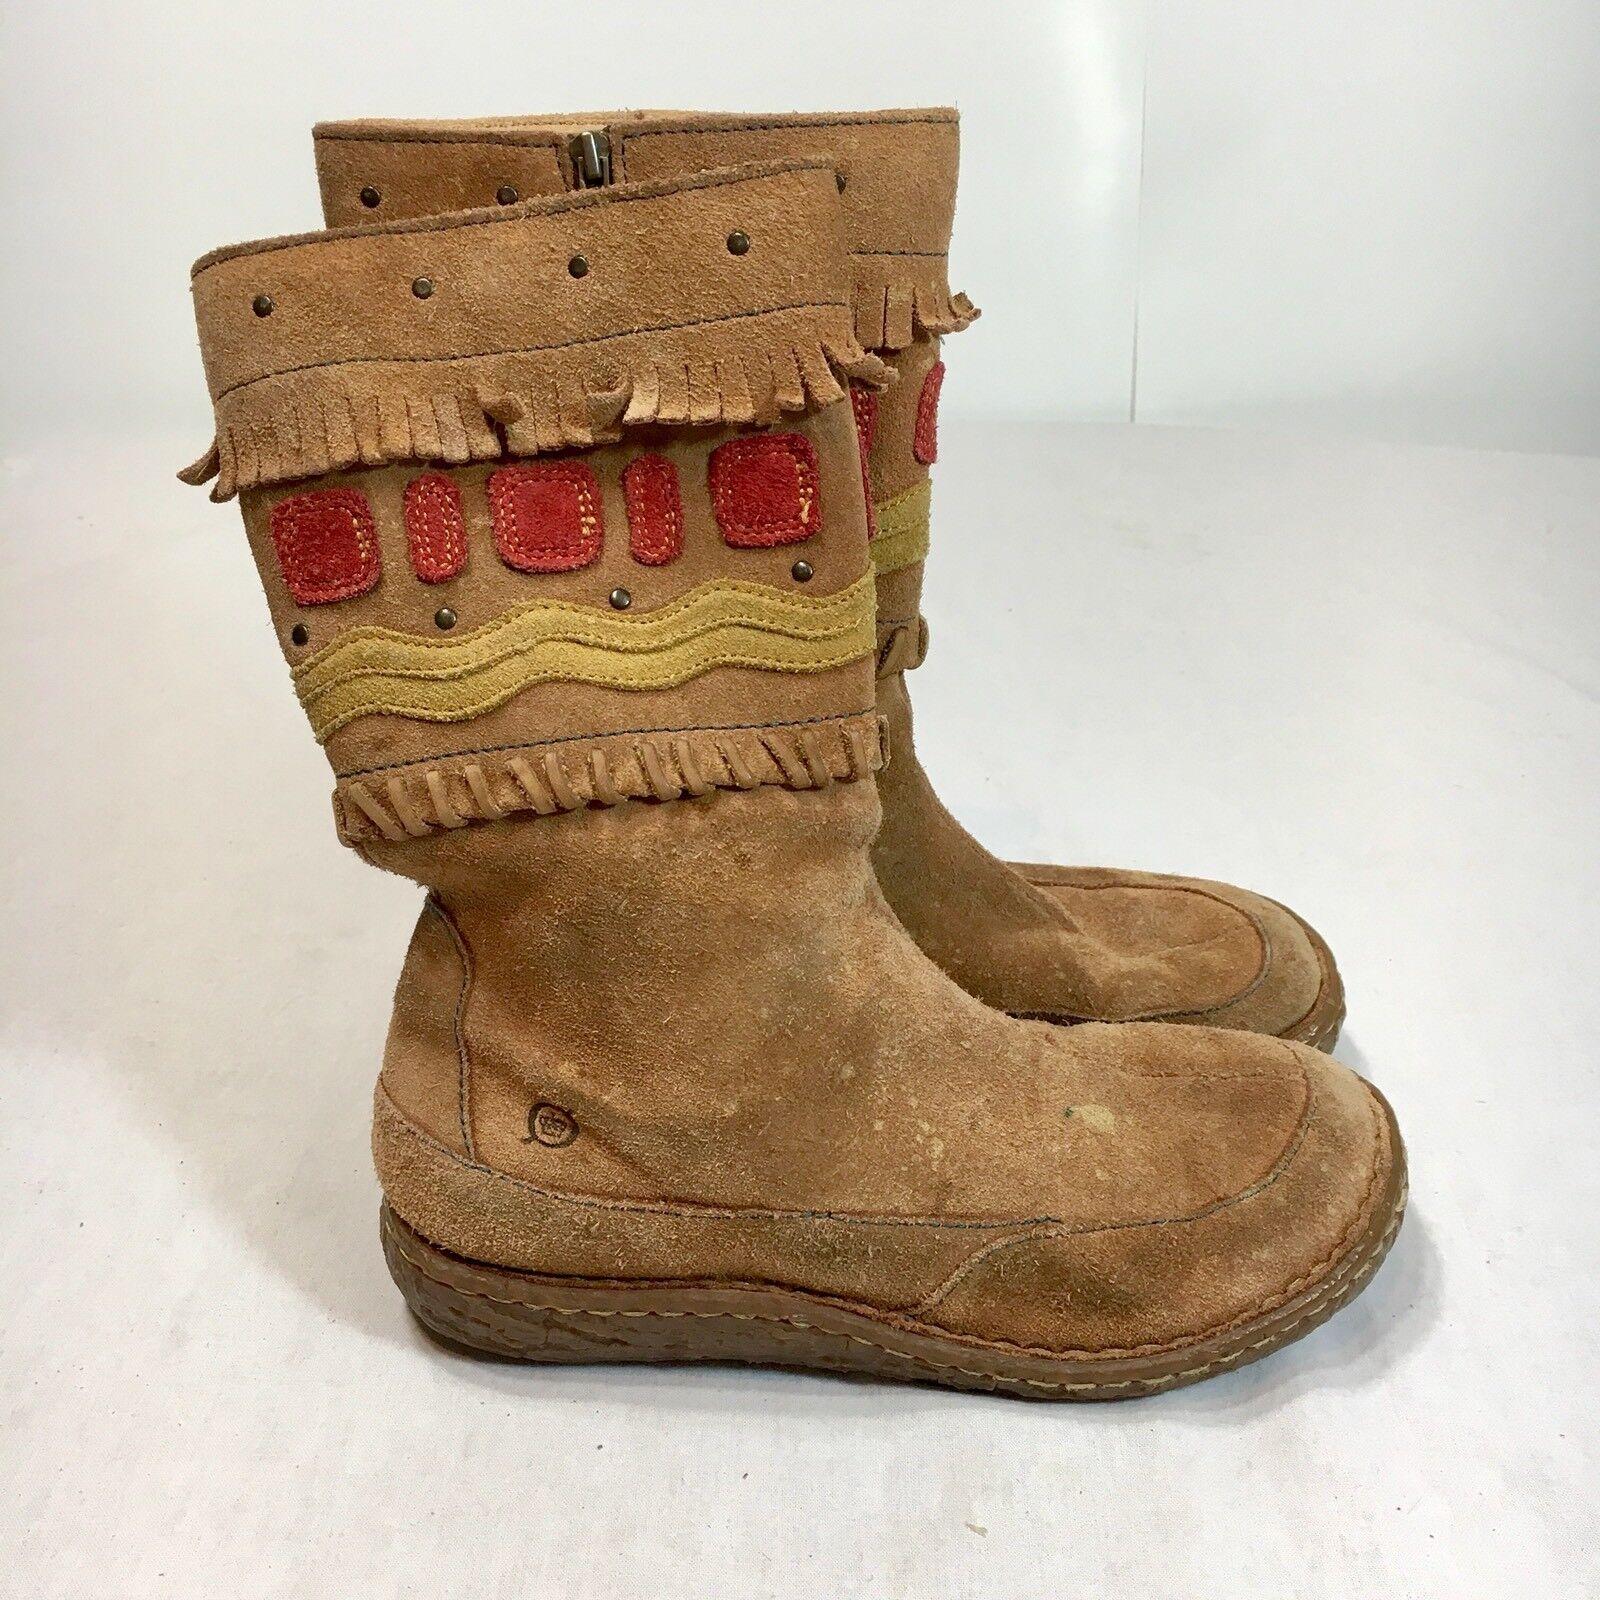 Born Born Born Concept Boc Women's 3 / 35 Brown Suede Leather Moc Toe Aztec Pattern Boots 19aa7f